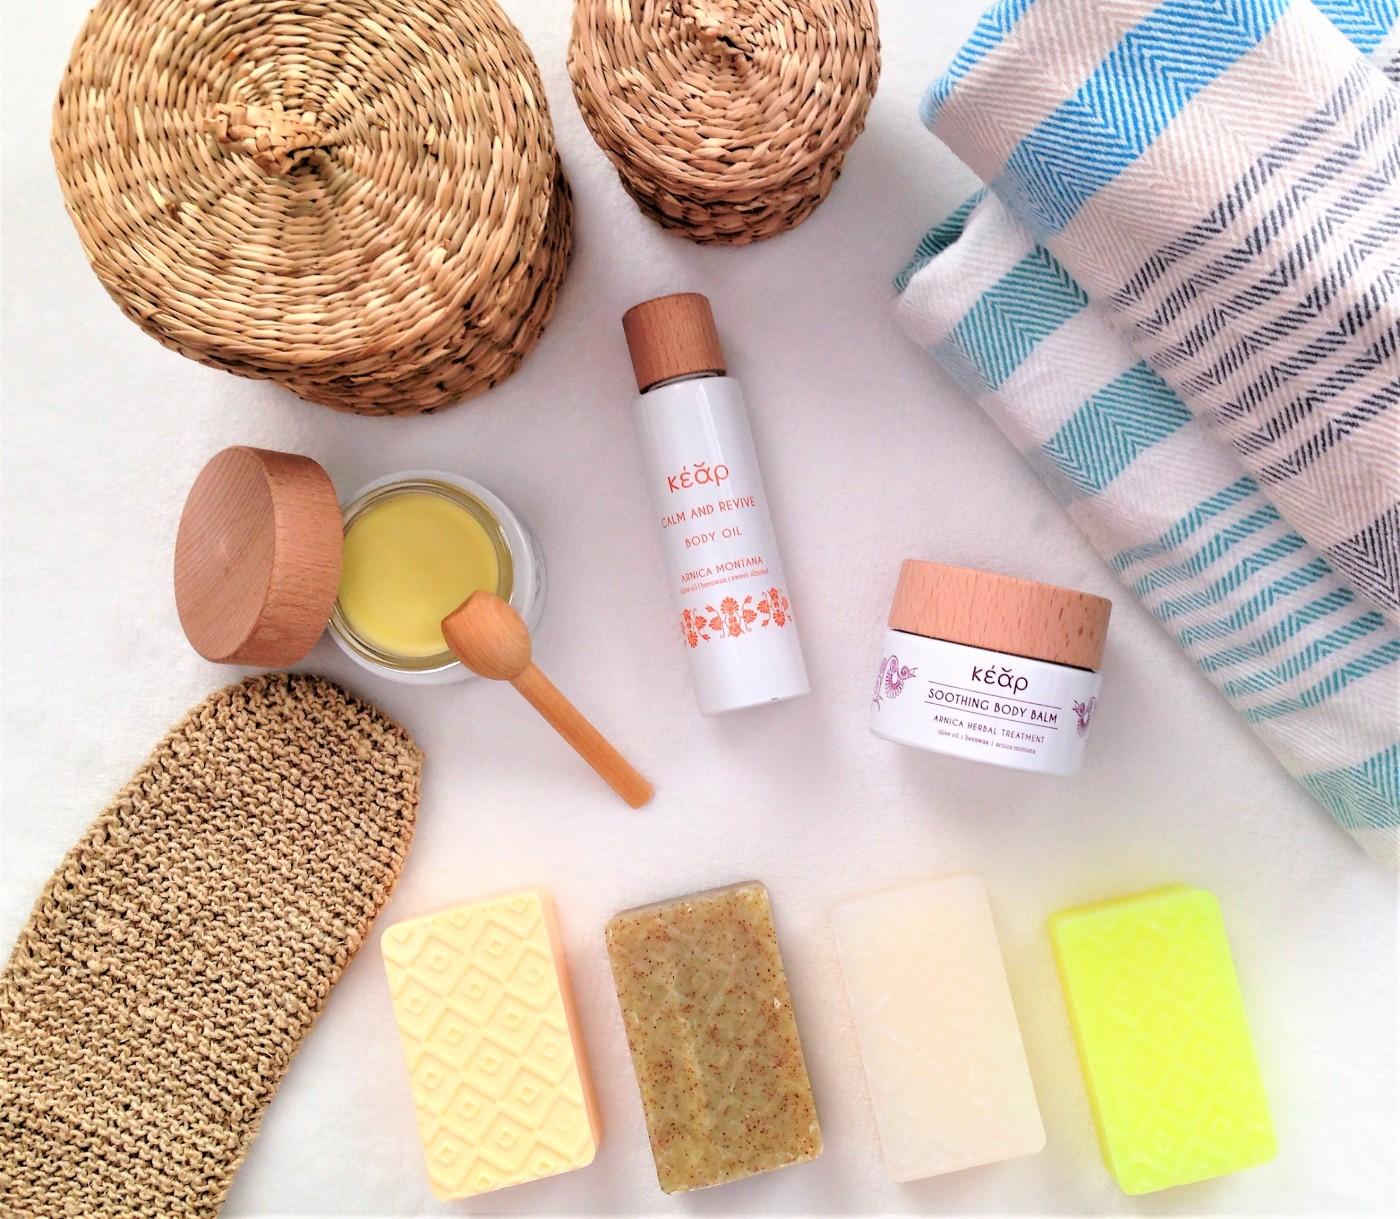 kear natural cosmetics soaps balms oil review